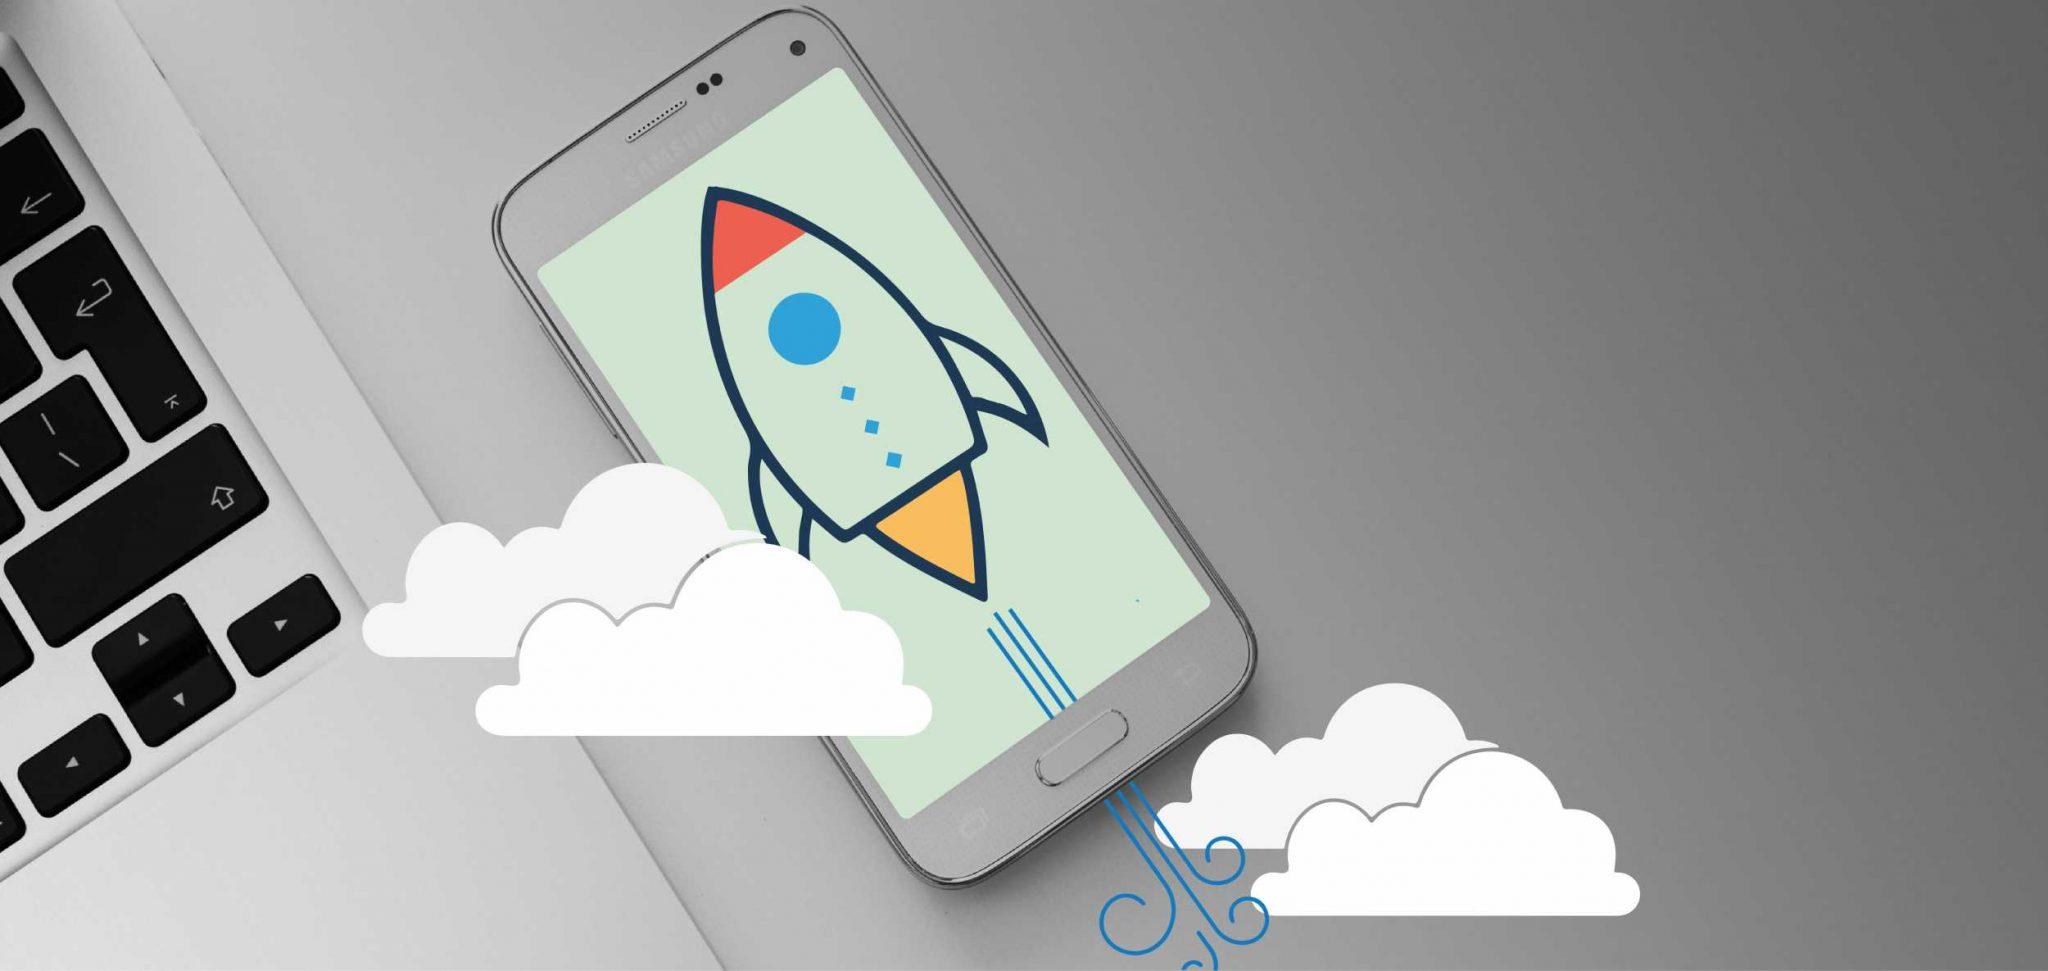 mobile app startup guide